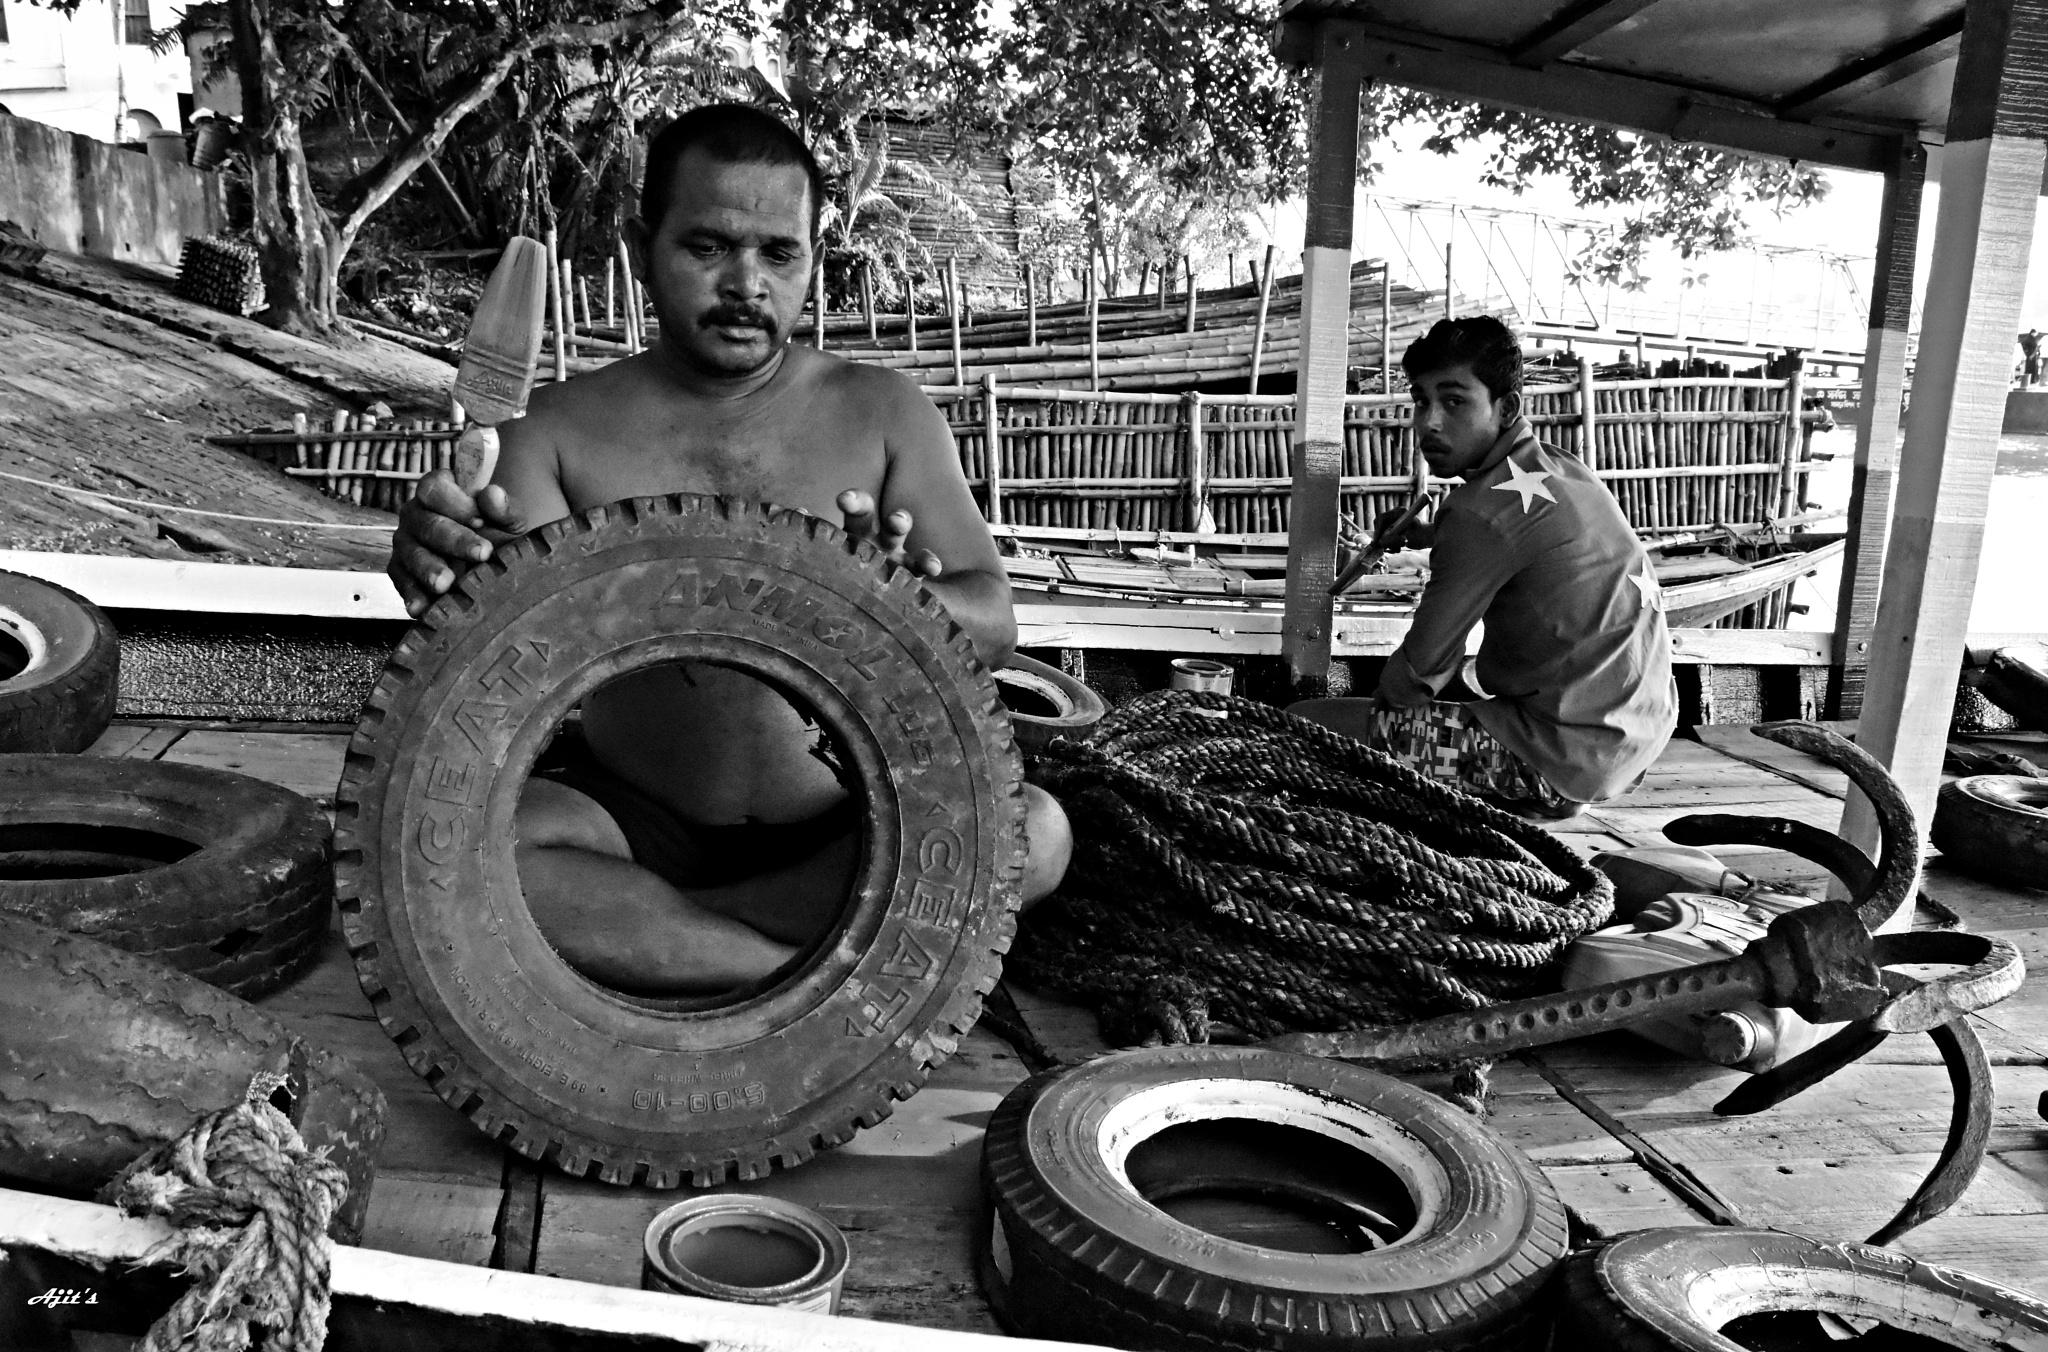 DAILY LIFE by Ajit Kumar Majhi